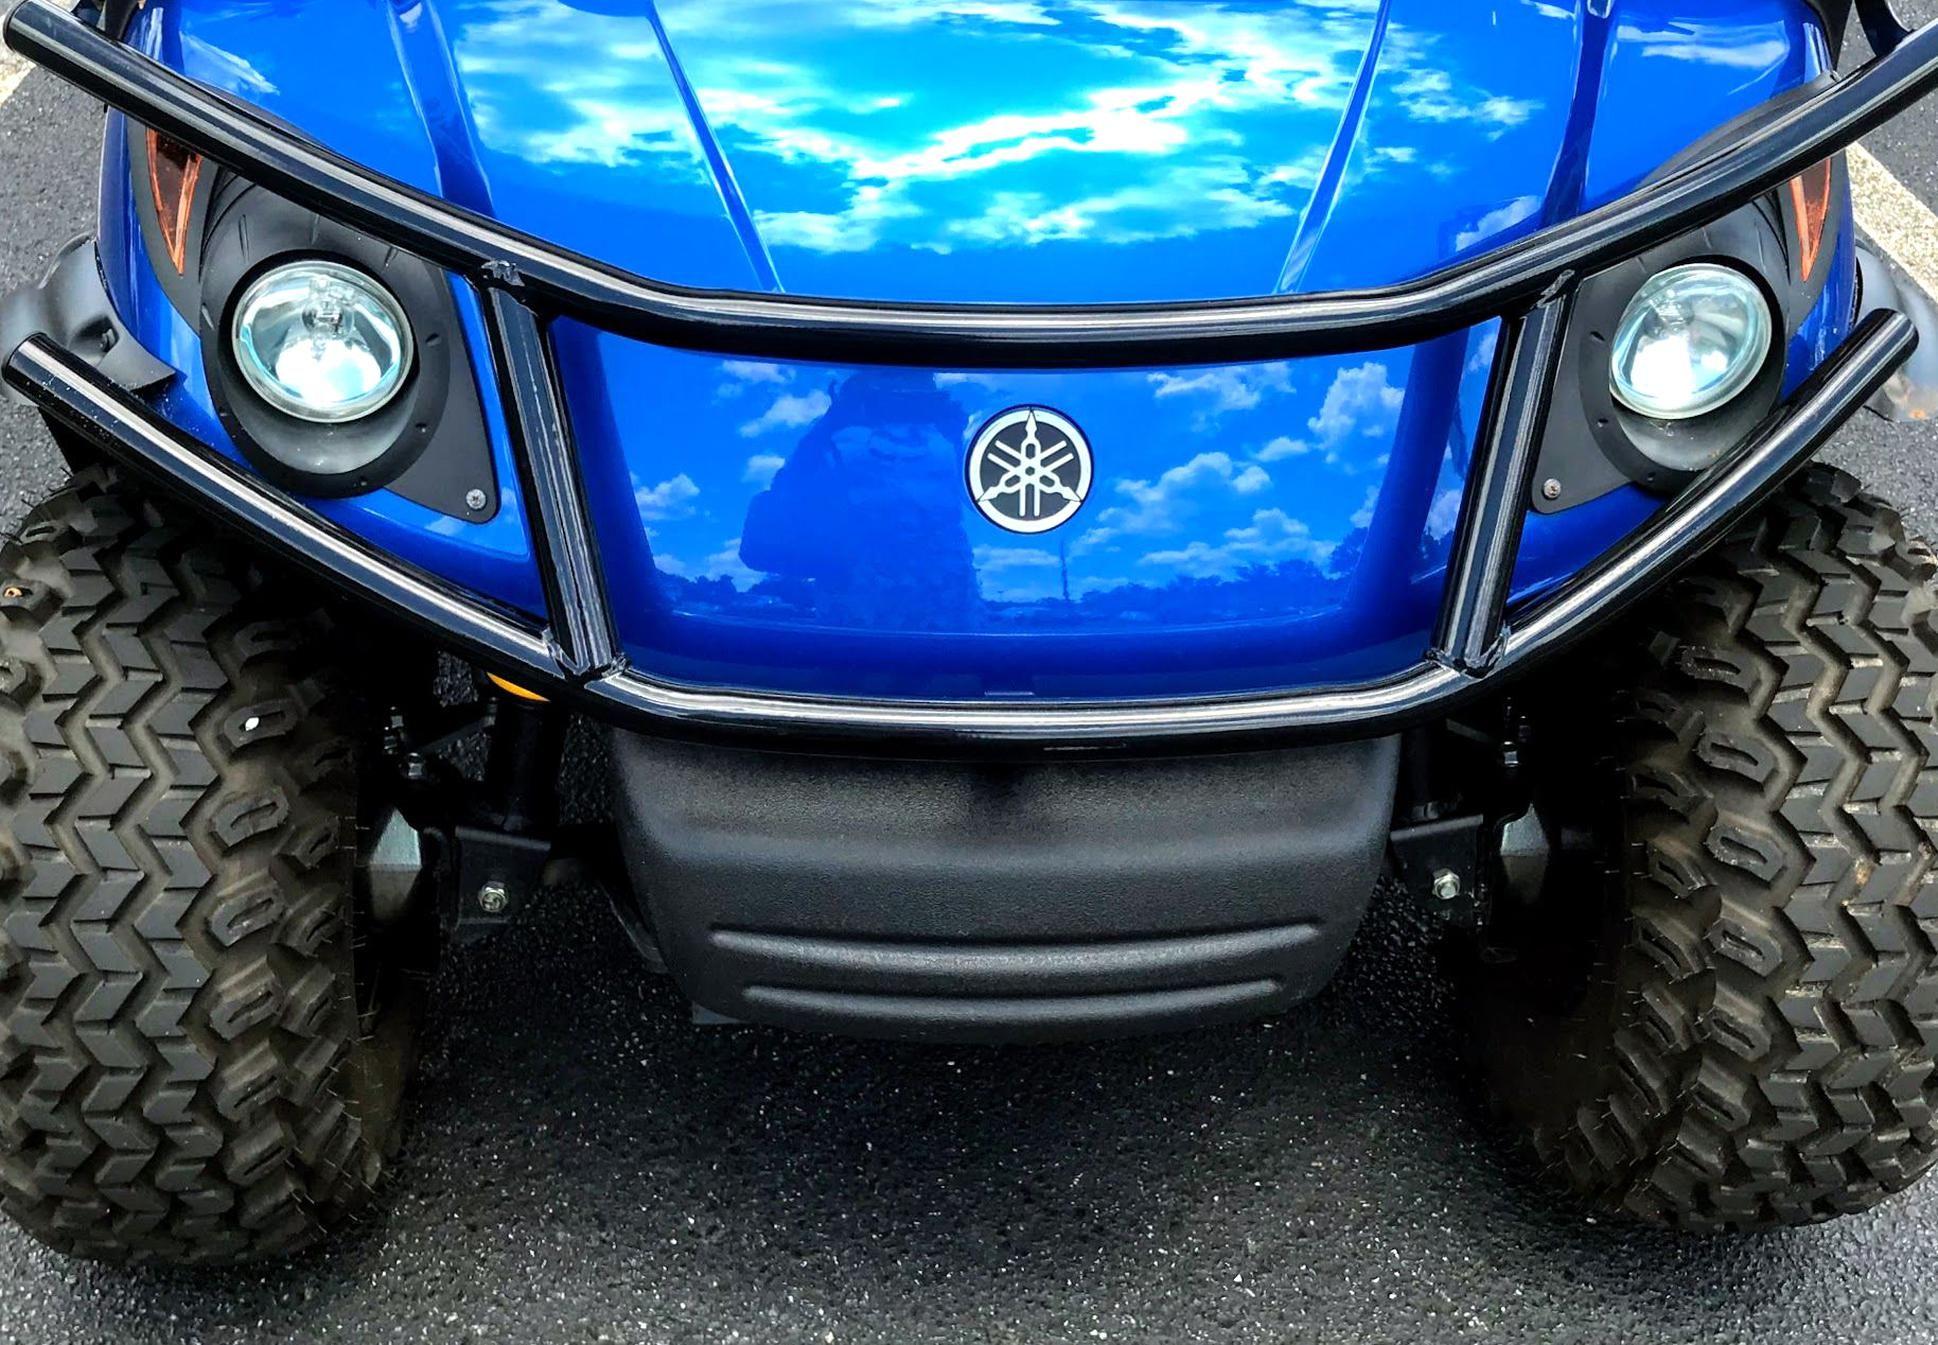 Customize Your Cart With Yamaha Golf Cart Accessories Like This Black Brush Guard Yamahagolfcartaccessorie Golf Cart Accessories Yamaha Golf Carts Golf Carts